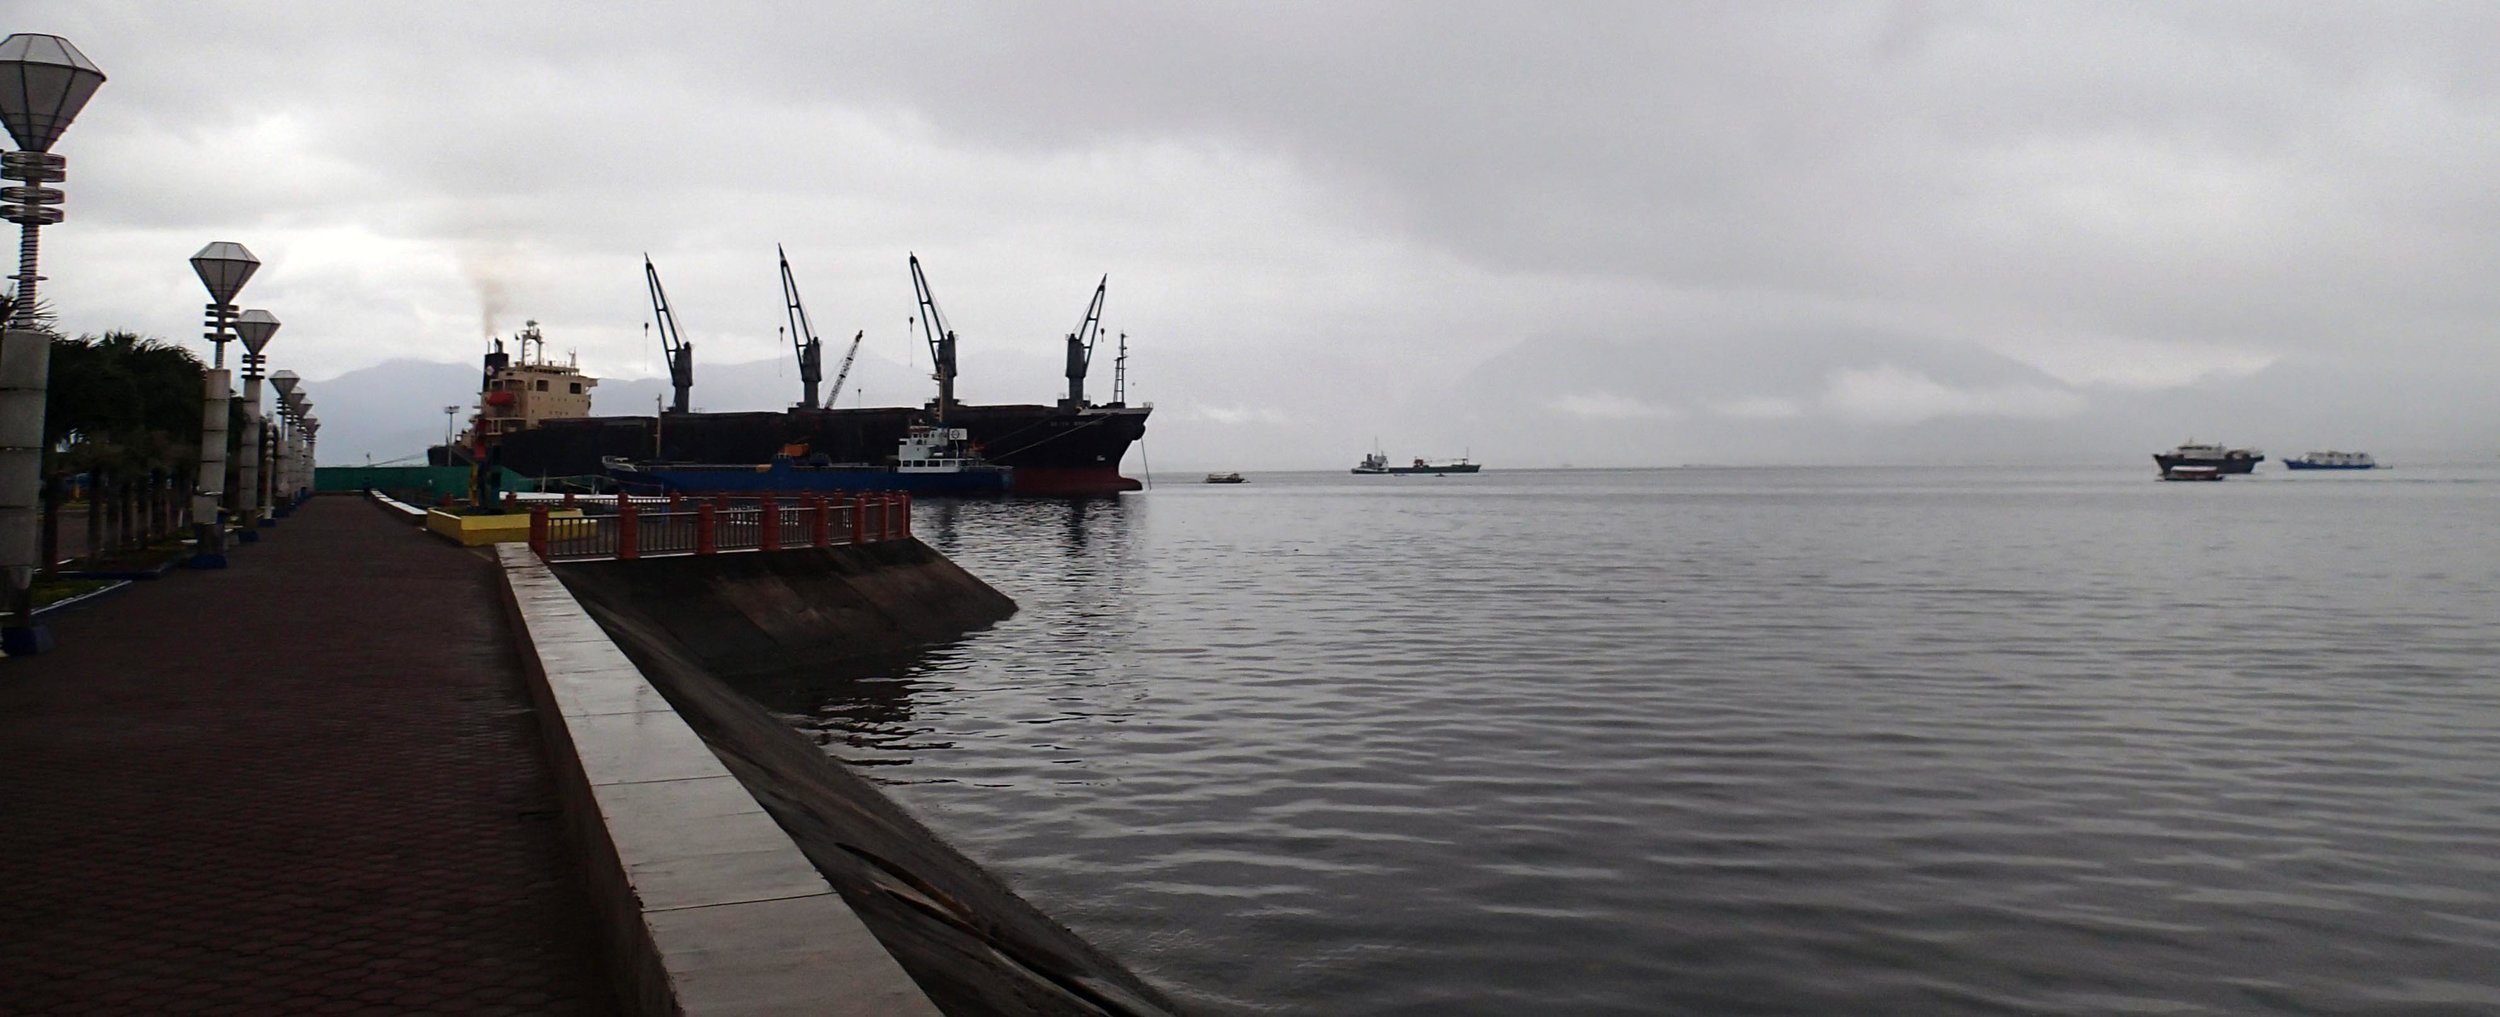 gloomy day on the bay.jpg